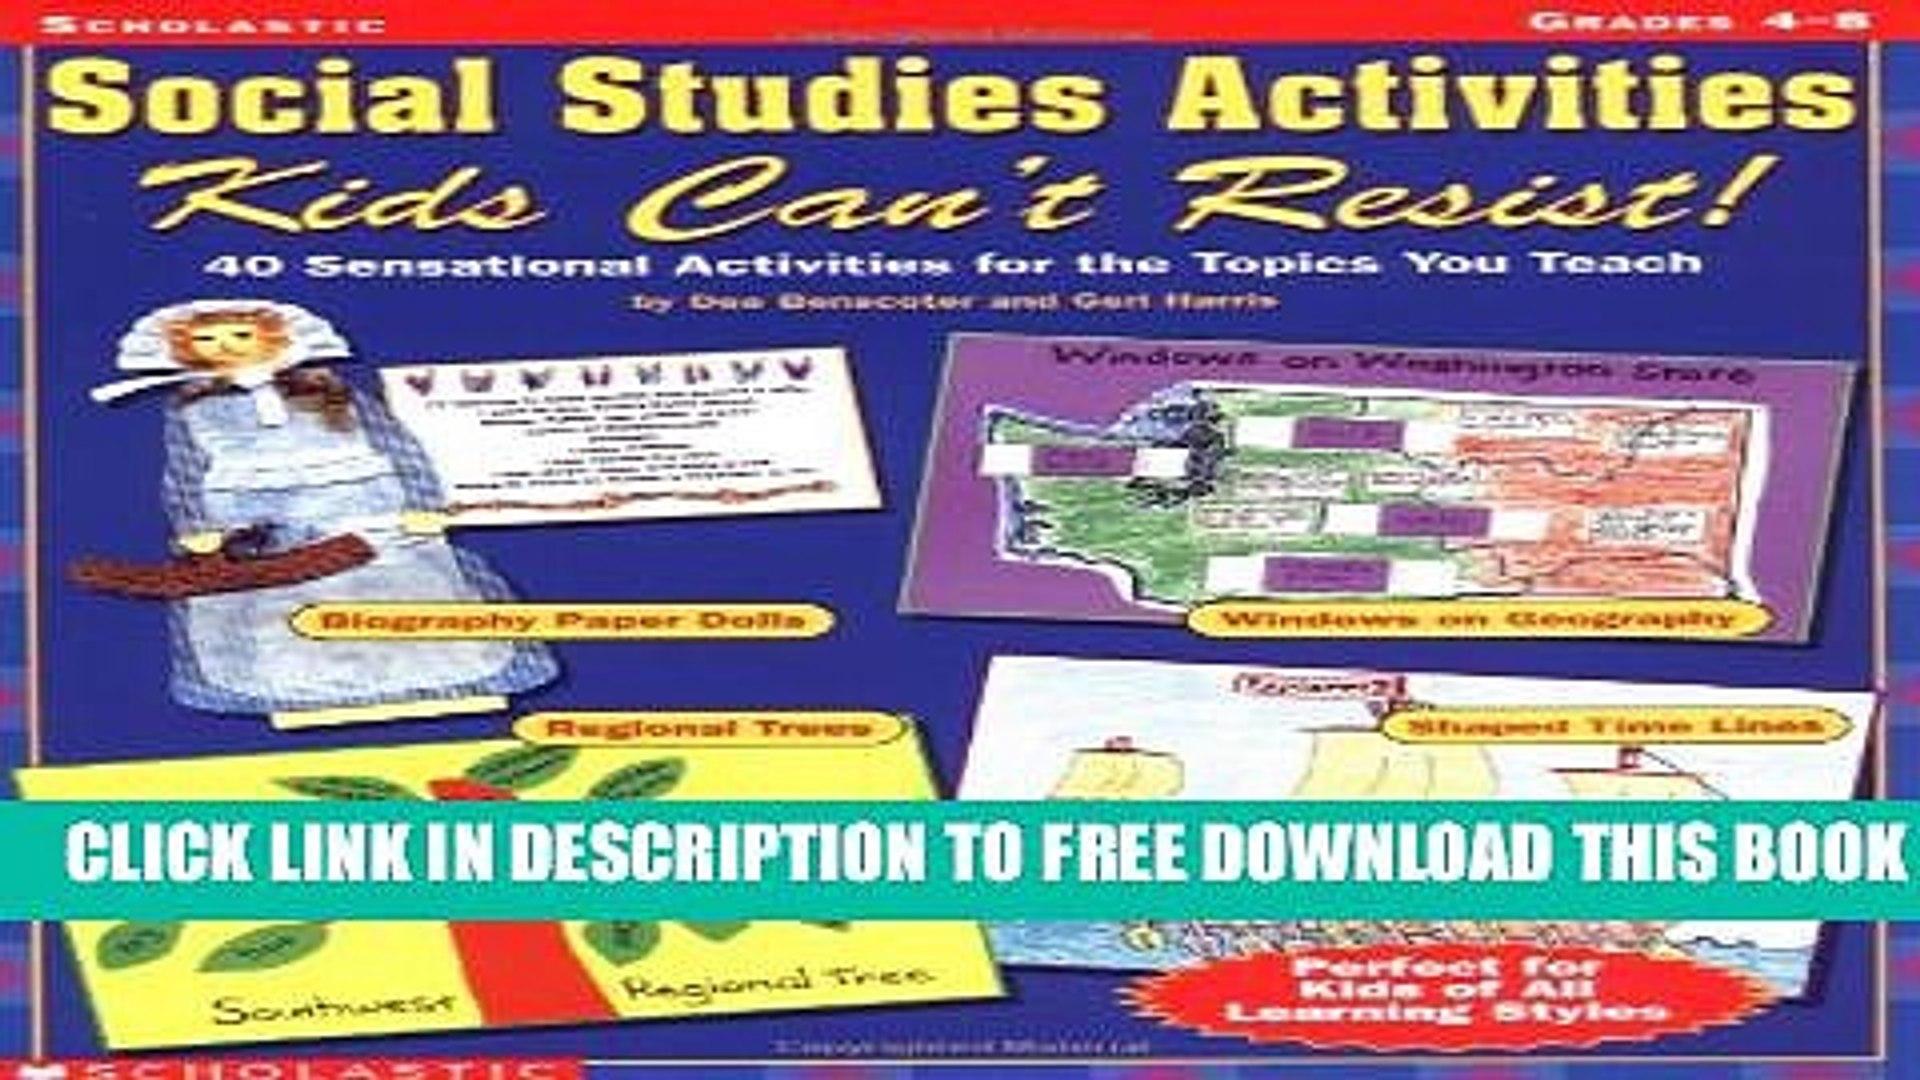 Collection Book Social Studies Activities Kids Can  T Resist!: 40 Sensational Activities for the